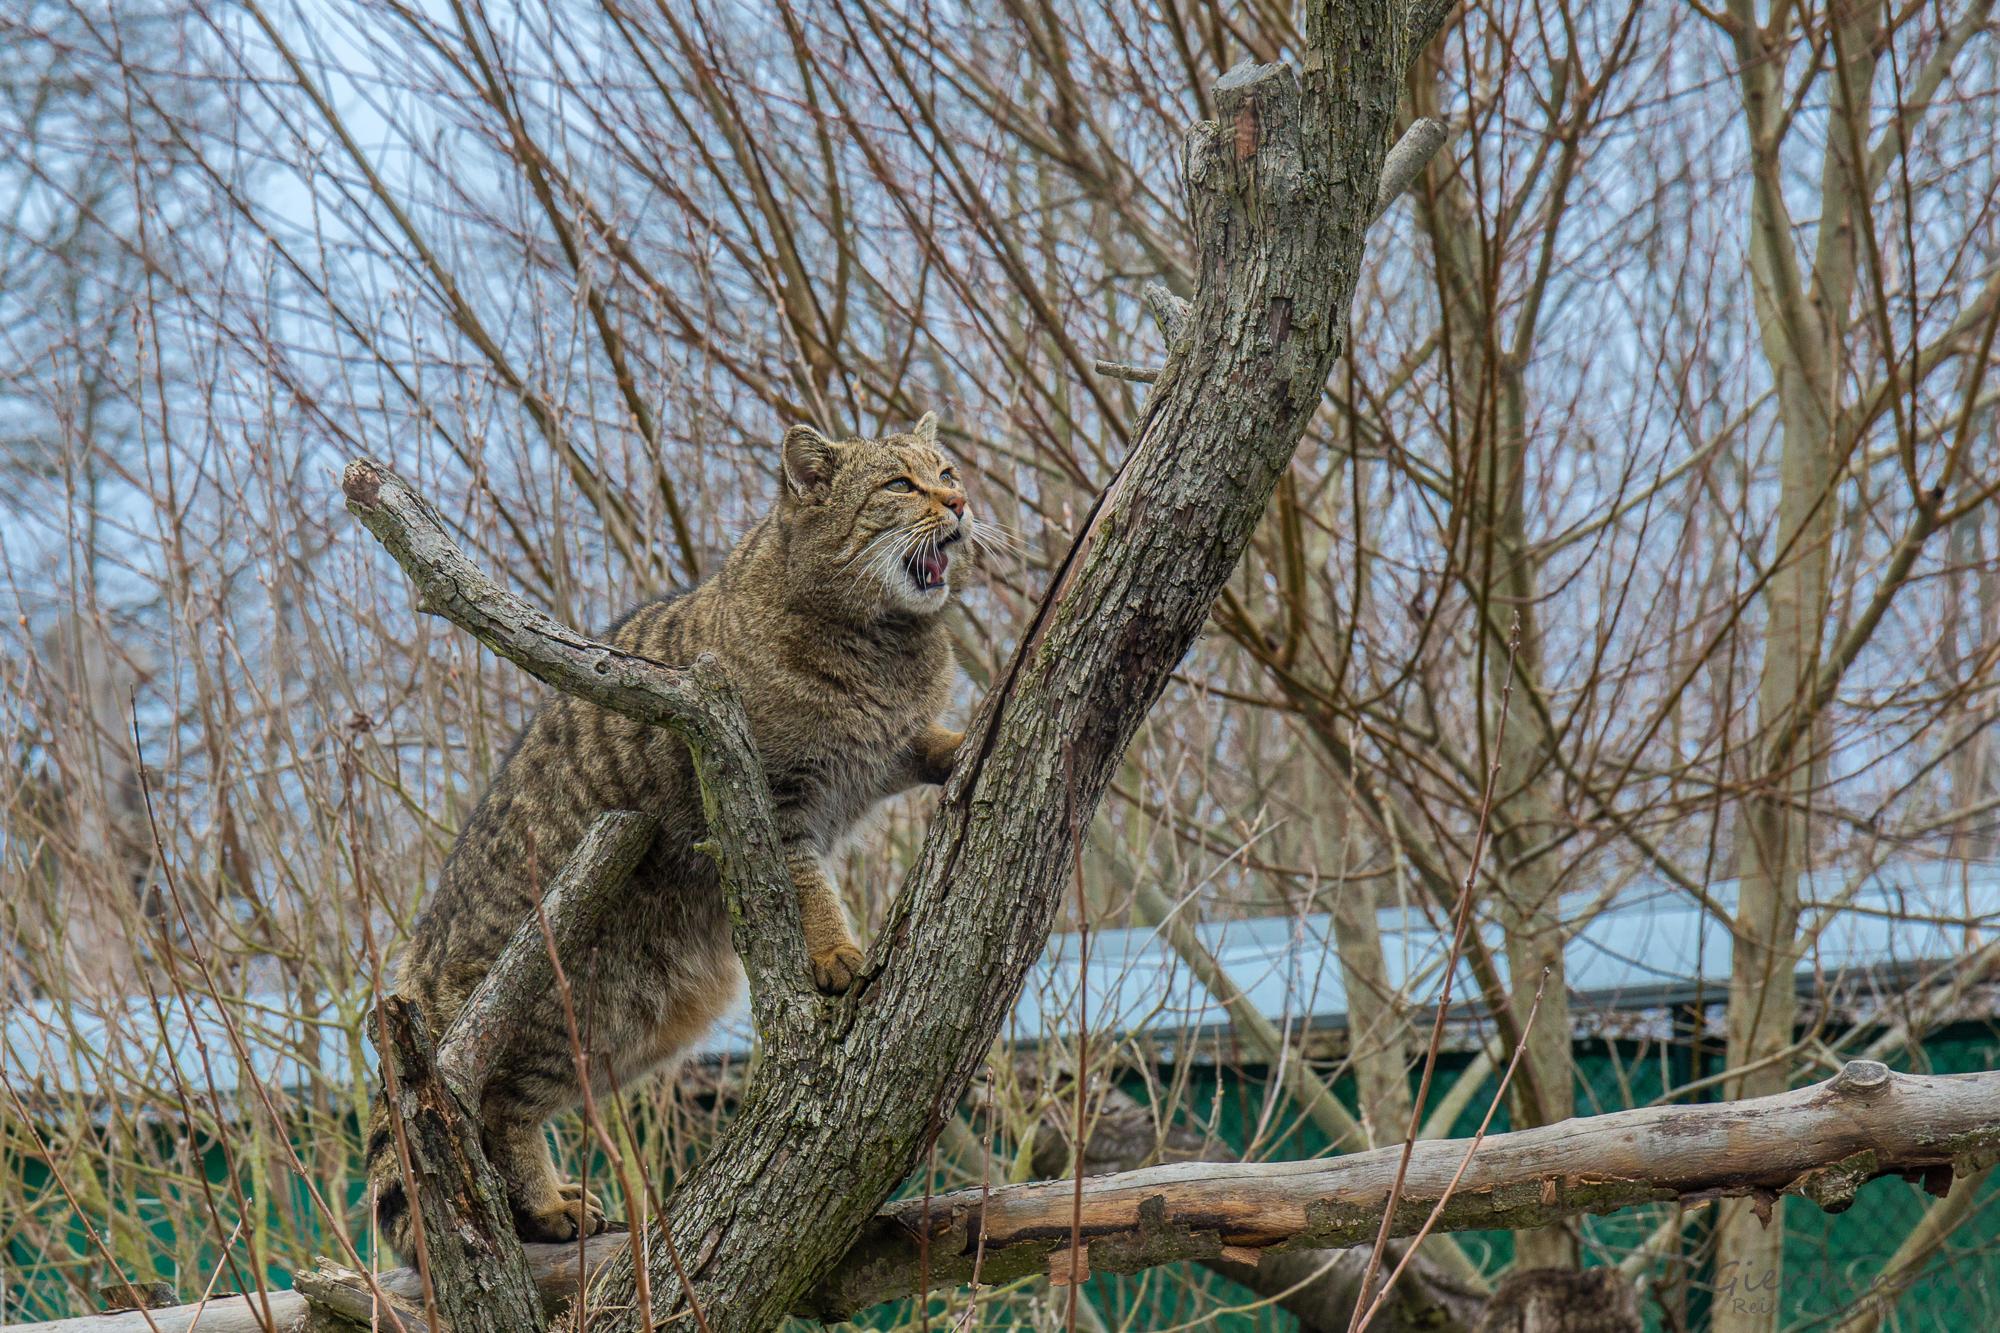 Das Wildkatzendorf Hütscheroda